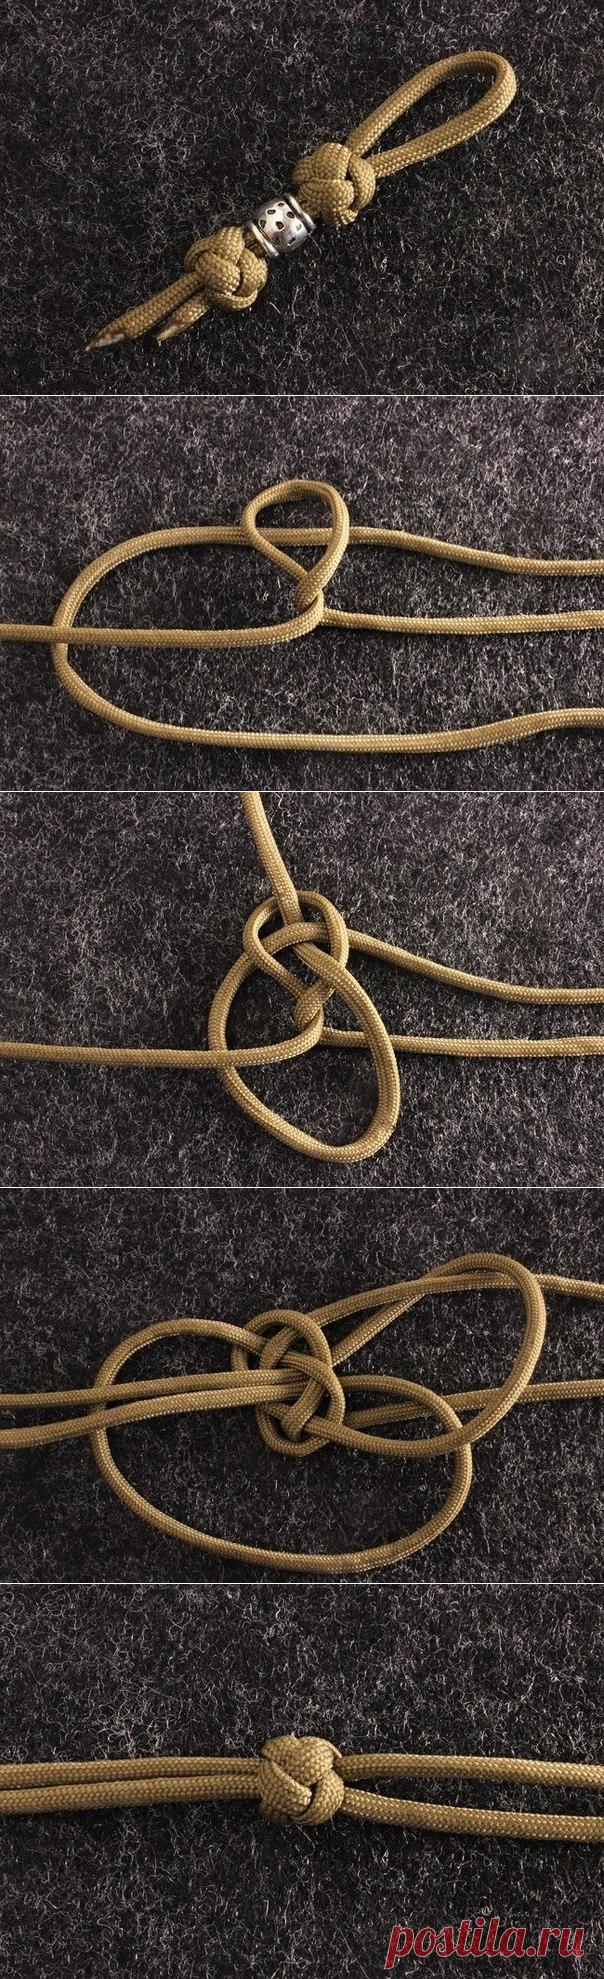 decorative knots instructions - 604×1979